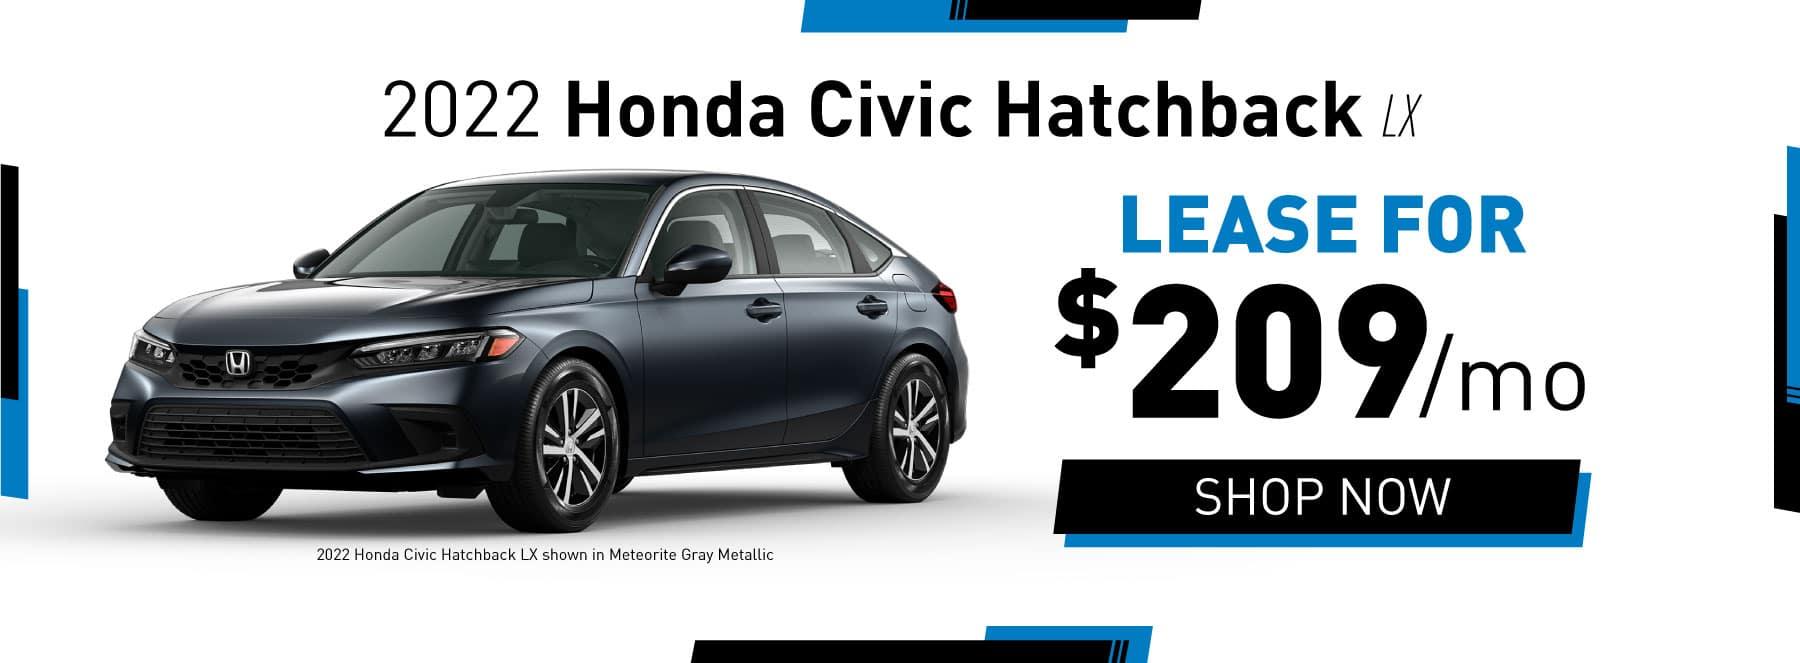 2022 Honda Civic Hatchback EX Lease for $209/mo